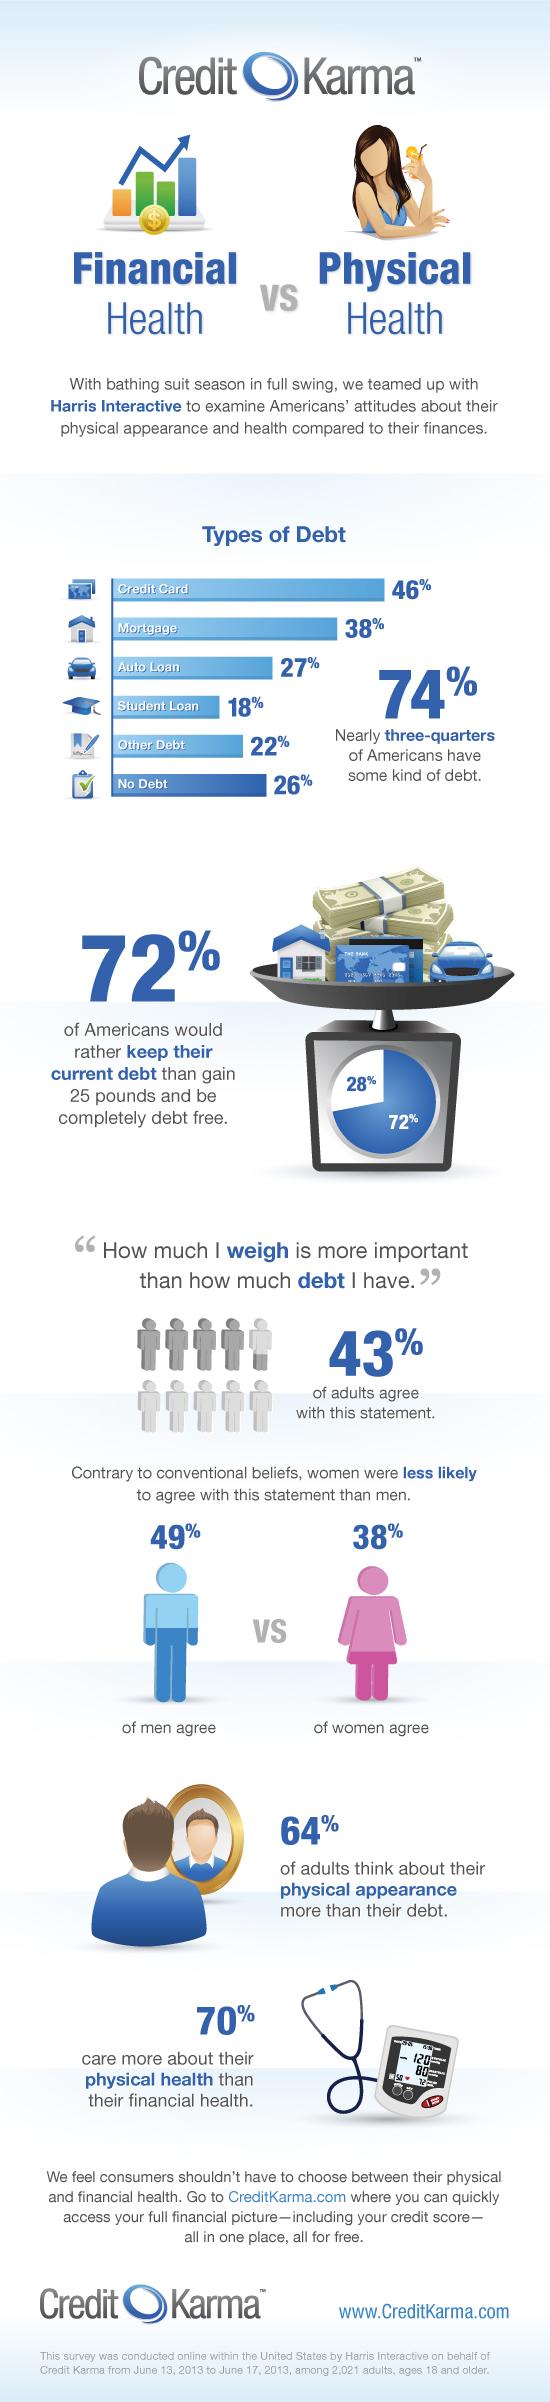 physical vs financial health